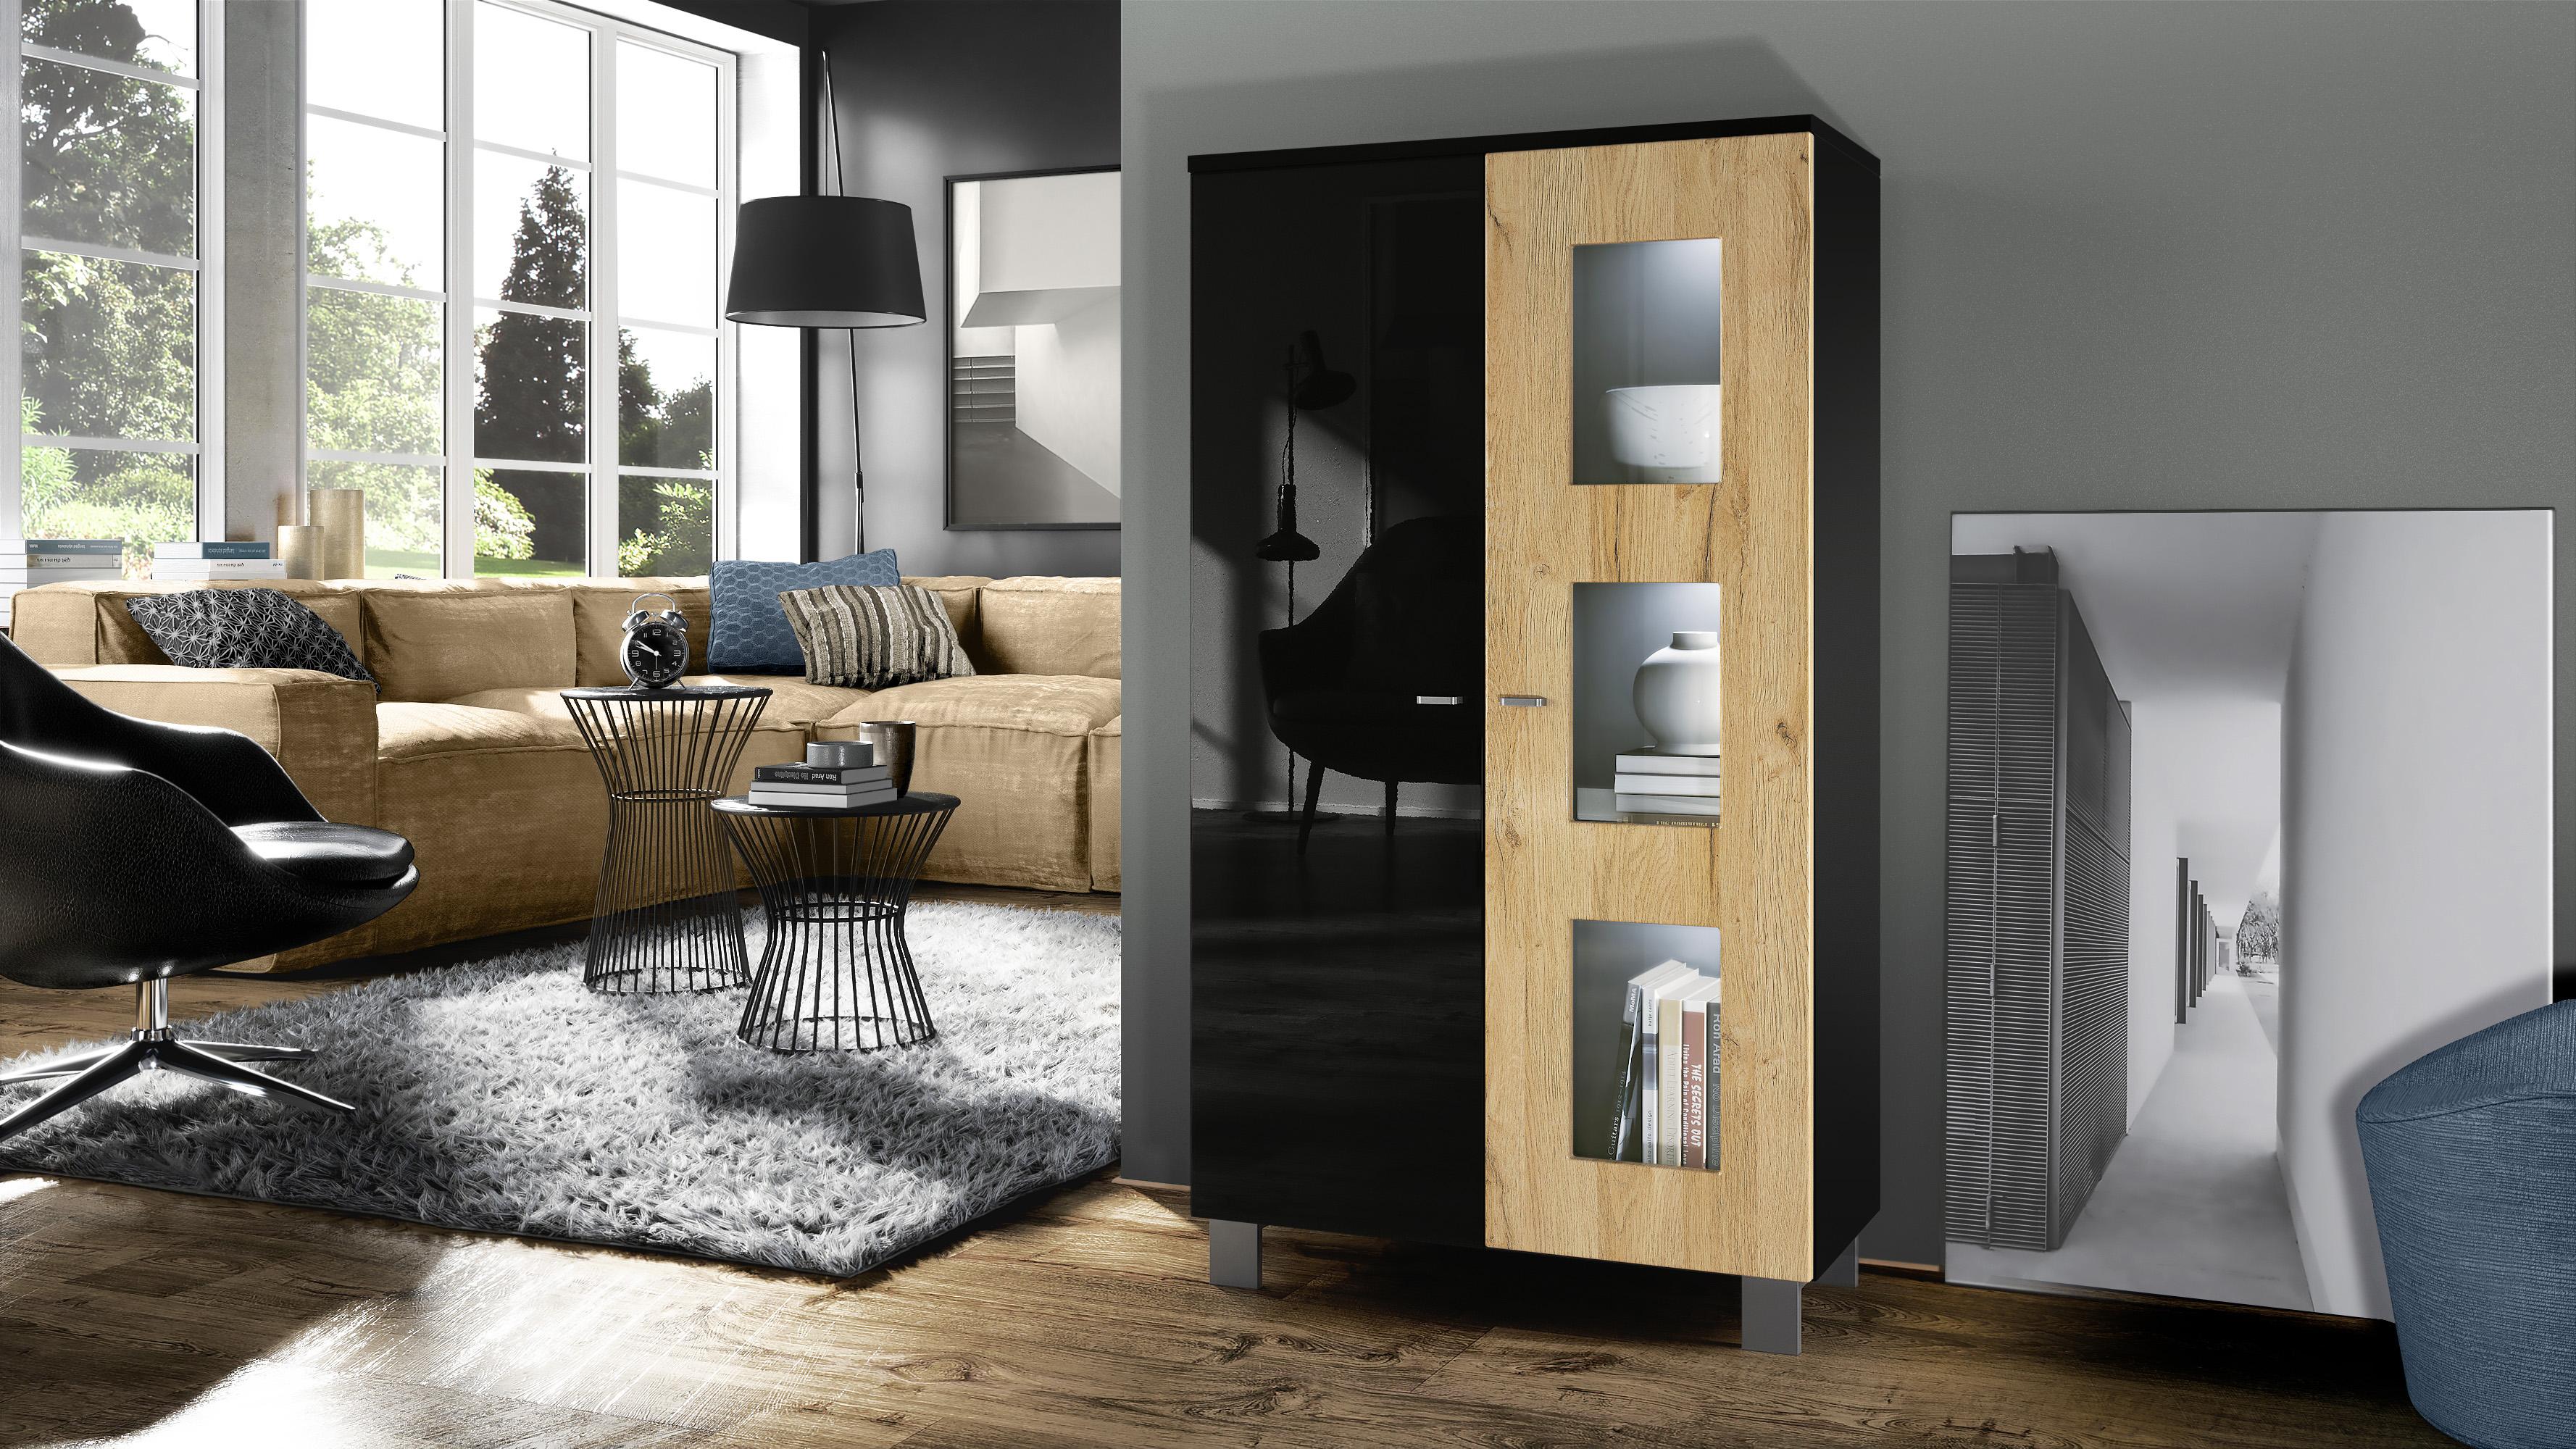 vitrine standvitrine kommode hochschrank sideboard denjo in schwarz ebay. Black Bedroom Furniture Sets. Home Design Ideas